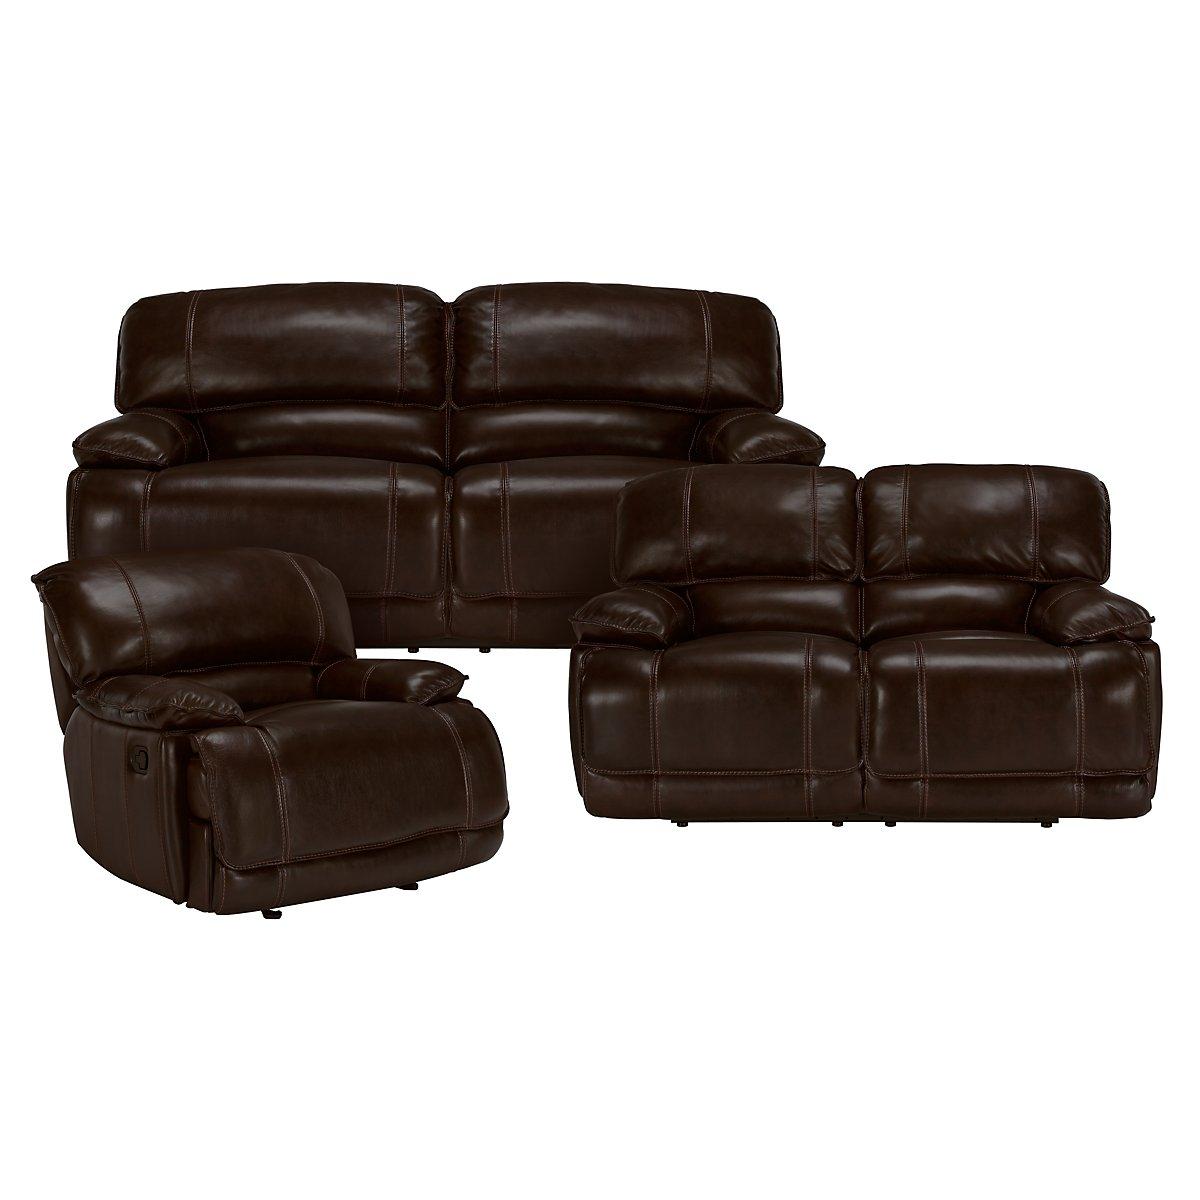 Benson Dark Brown Leather & Vinyl Power Reclining Living Room